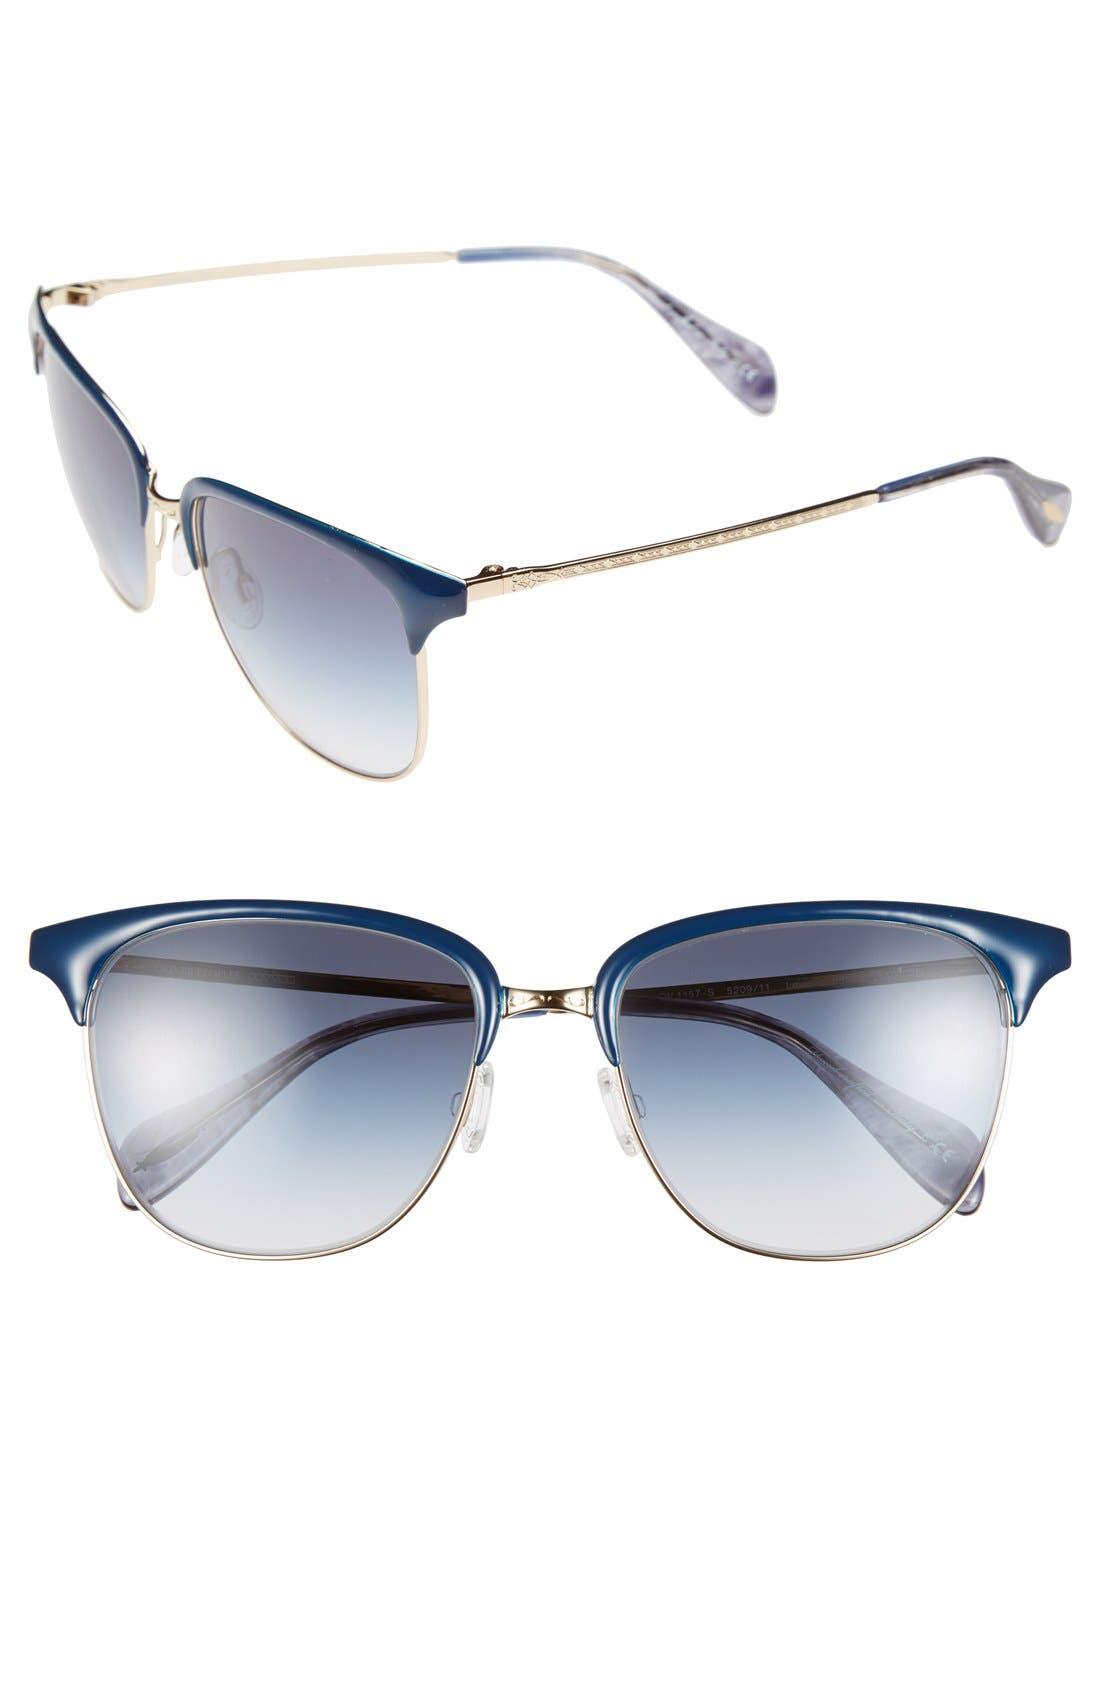 Main Image - Oliver Peoples 'Leiana' 55mm Sunglasses